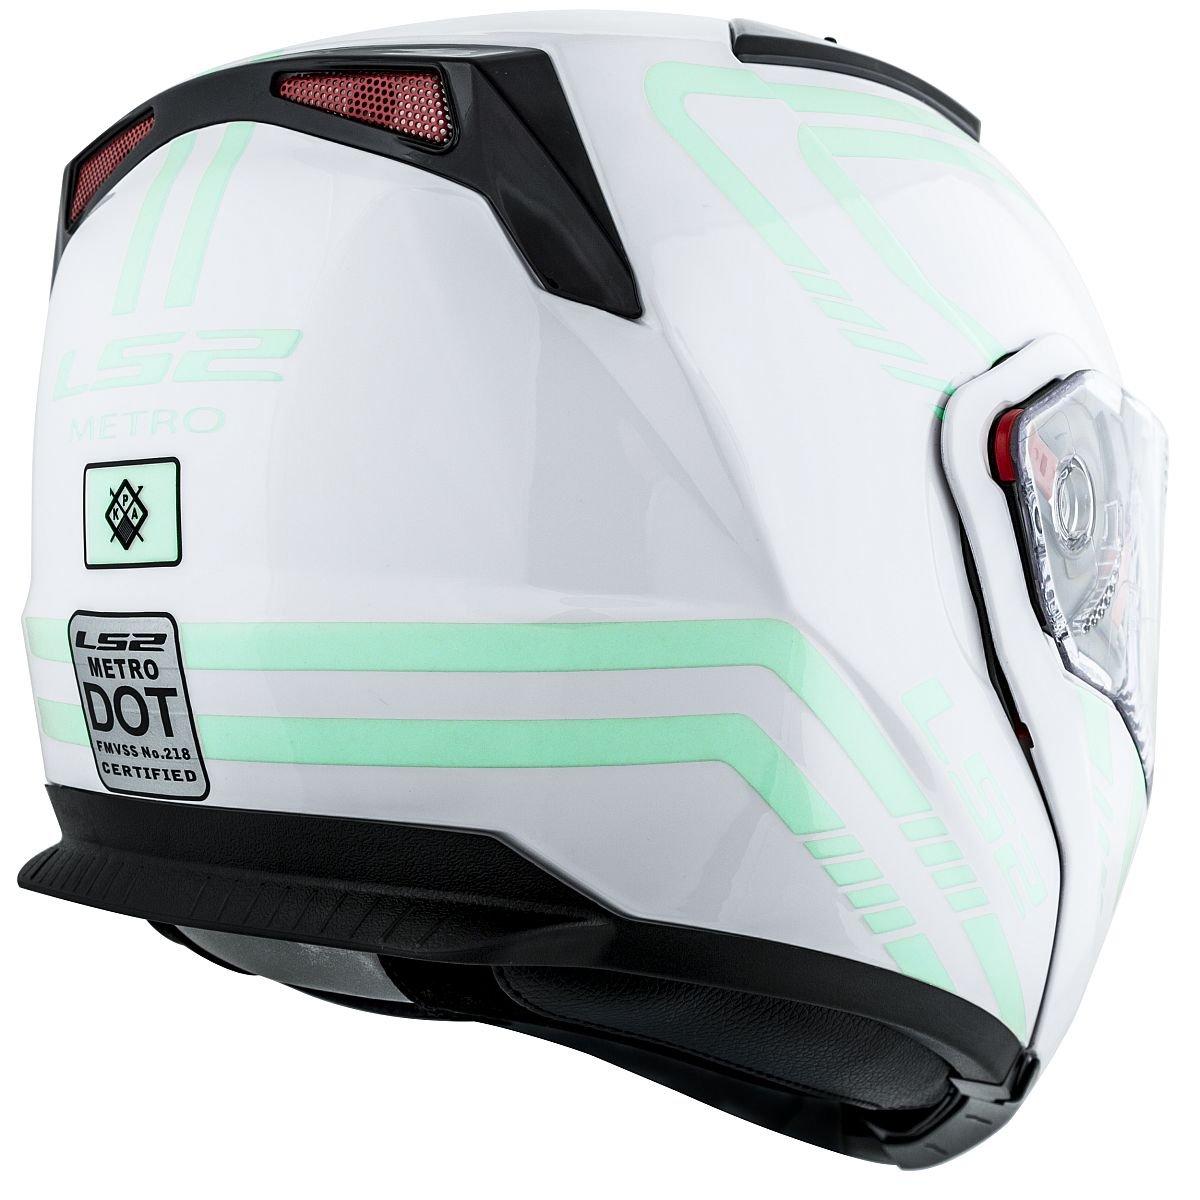 Amazon.com: LS2 Helmets Metro Firefly Modular Motorcycle Helmet with Sunshield (White, X-Small): Automotive